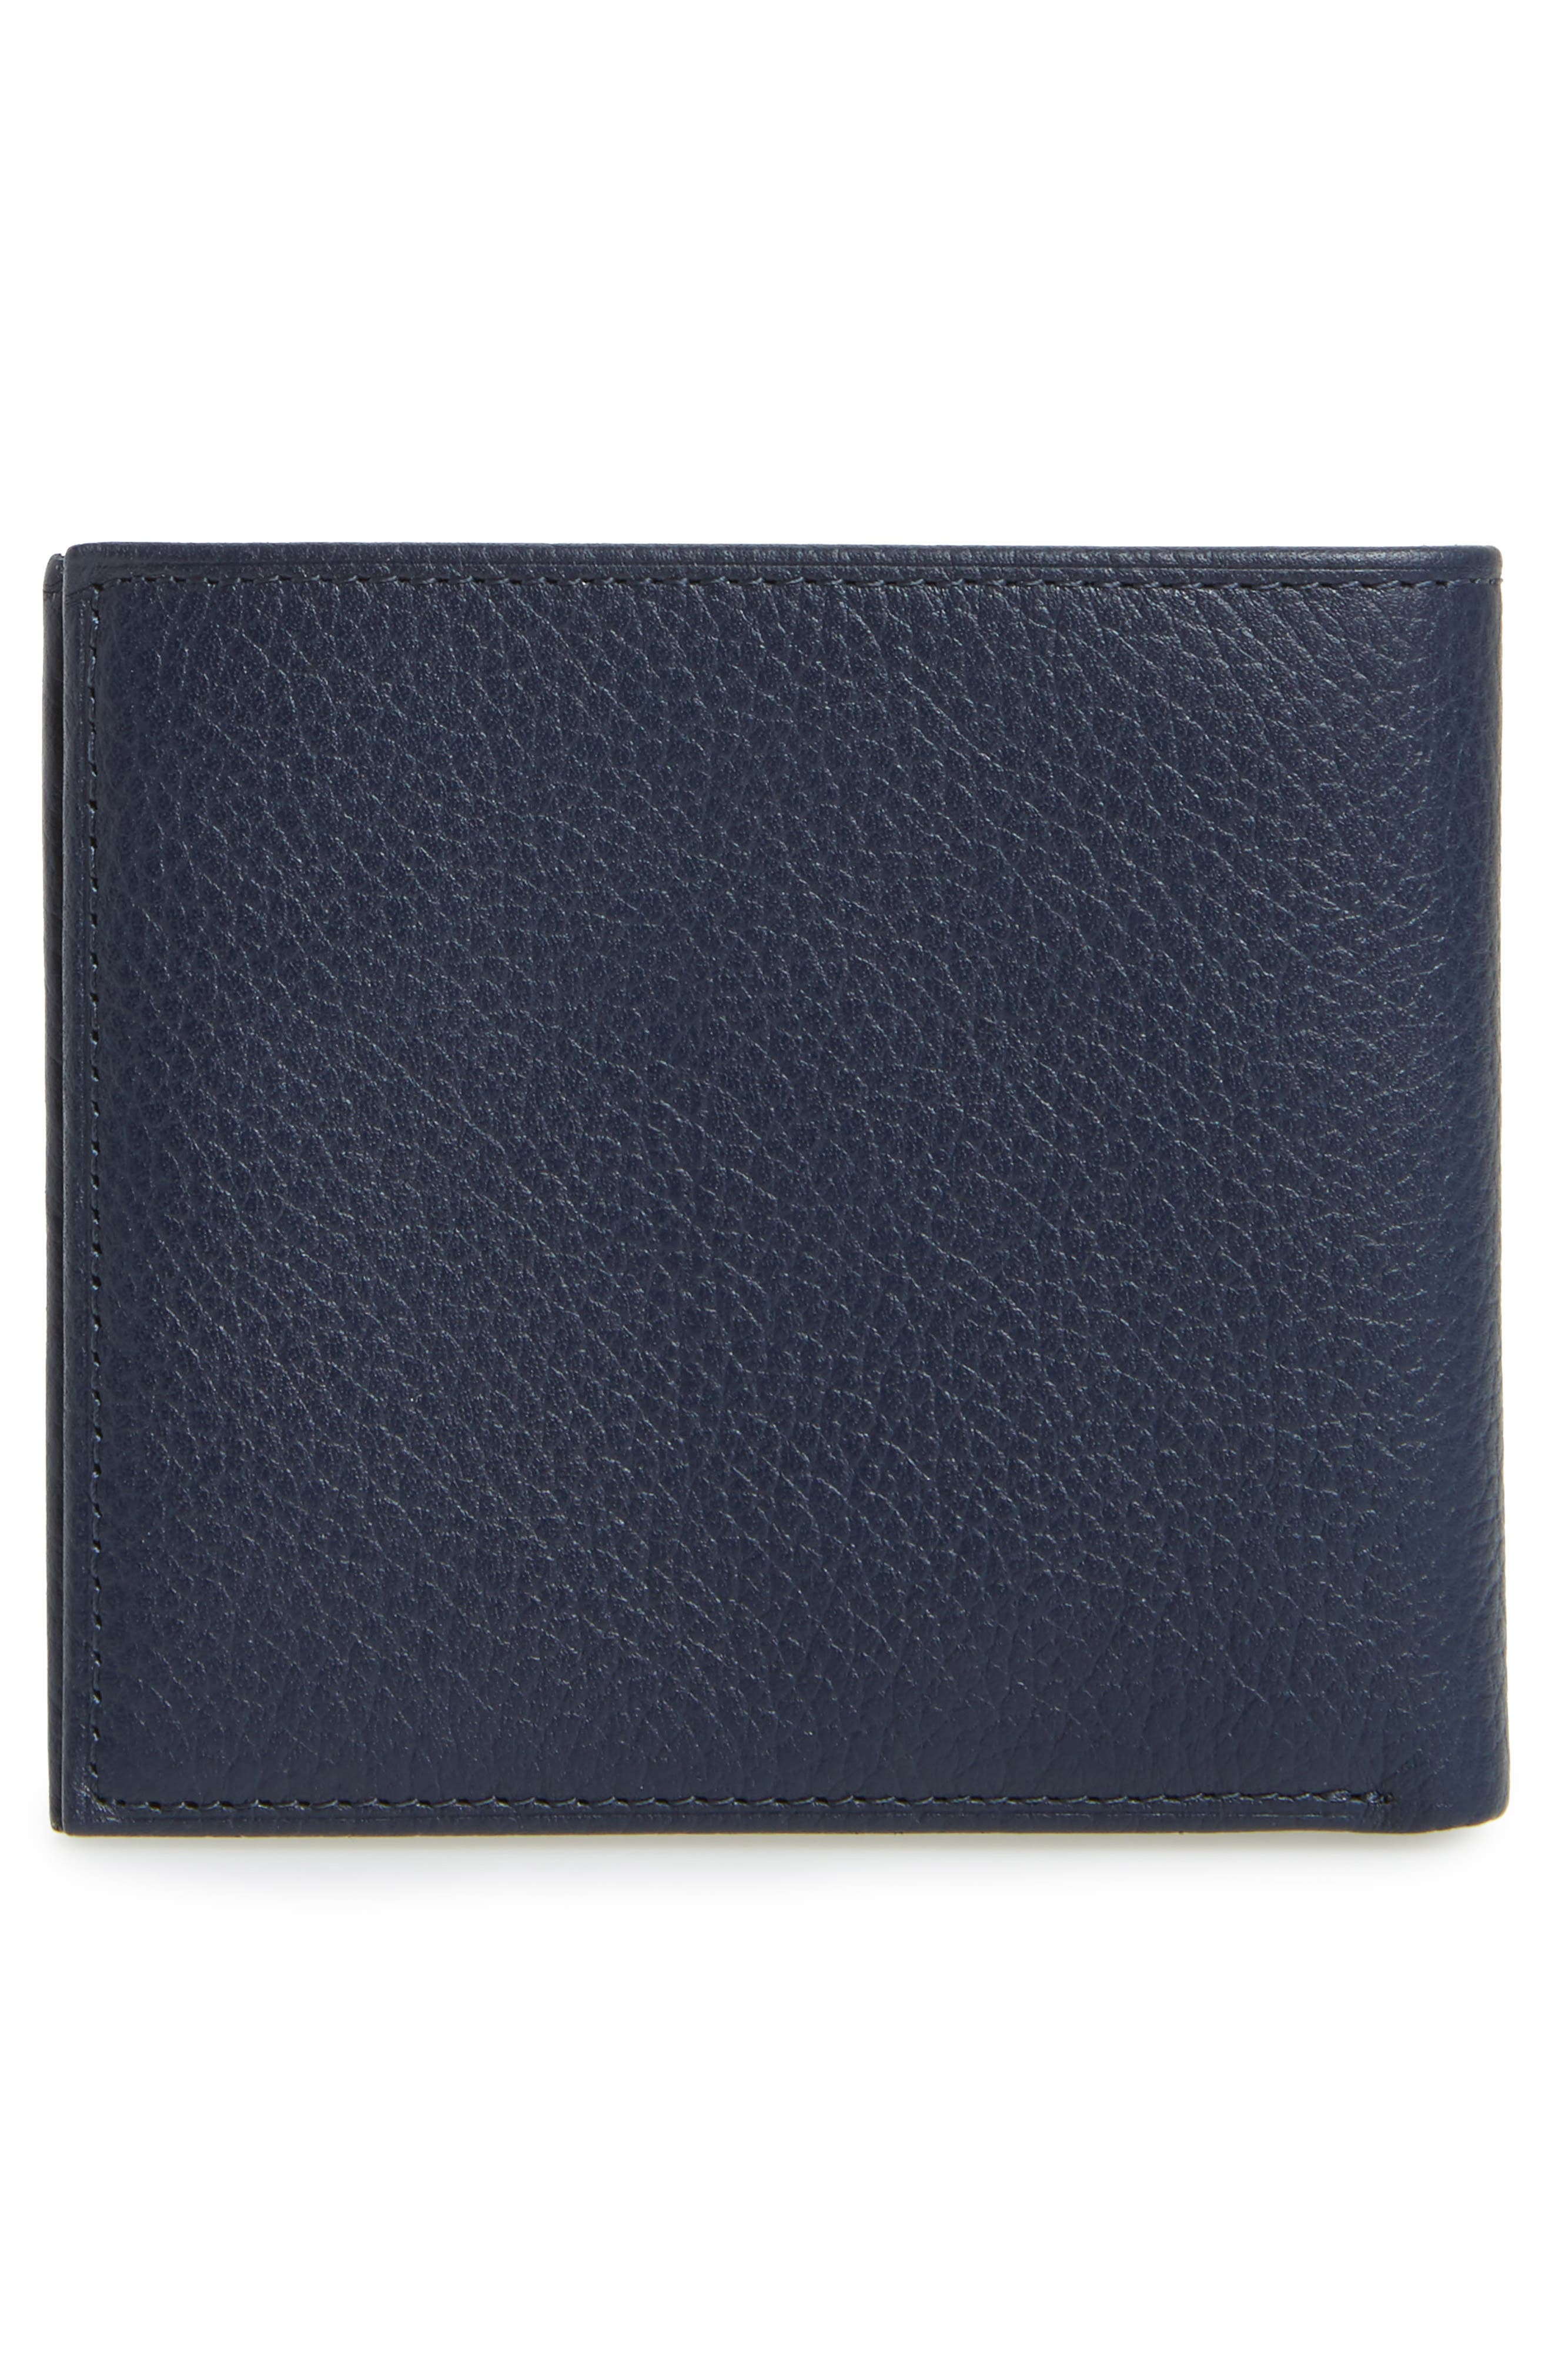 Leather Wallet,                             Alternate thumbnail 3, color,                             Blue